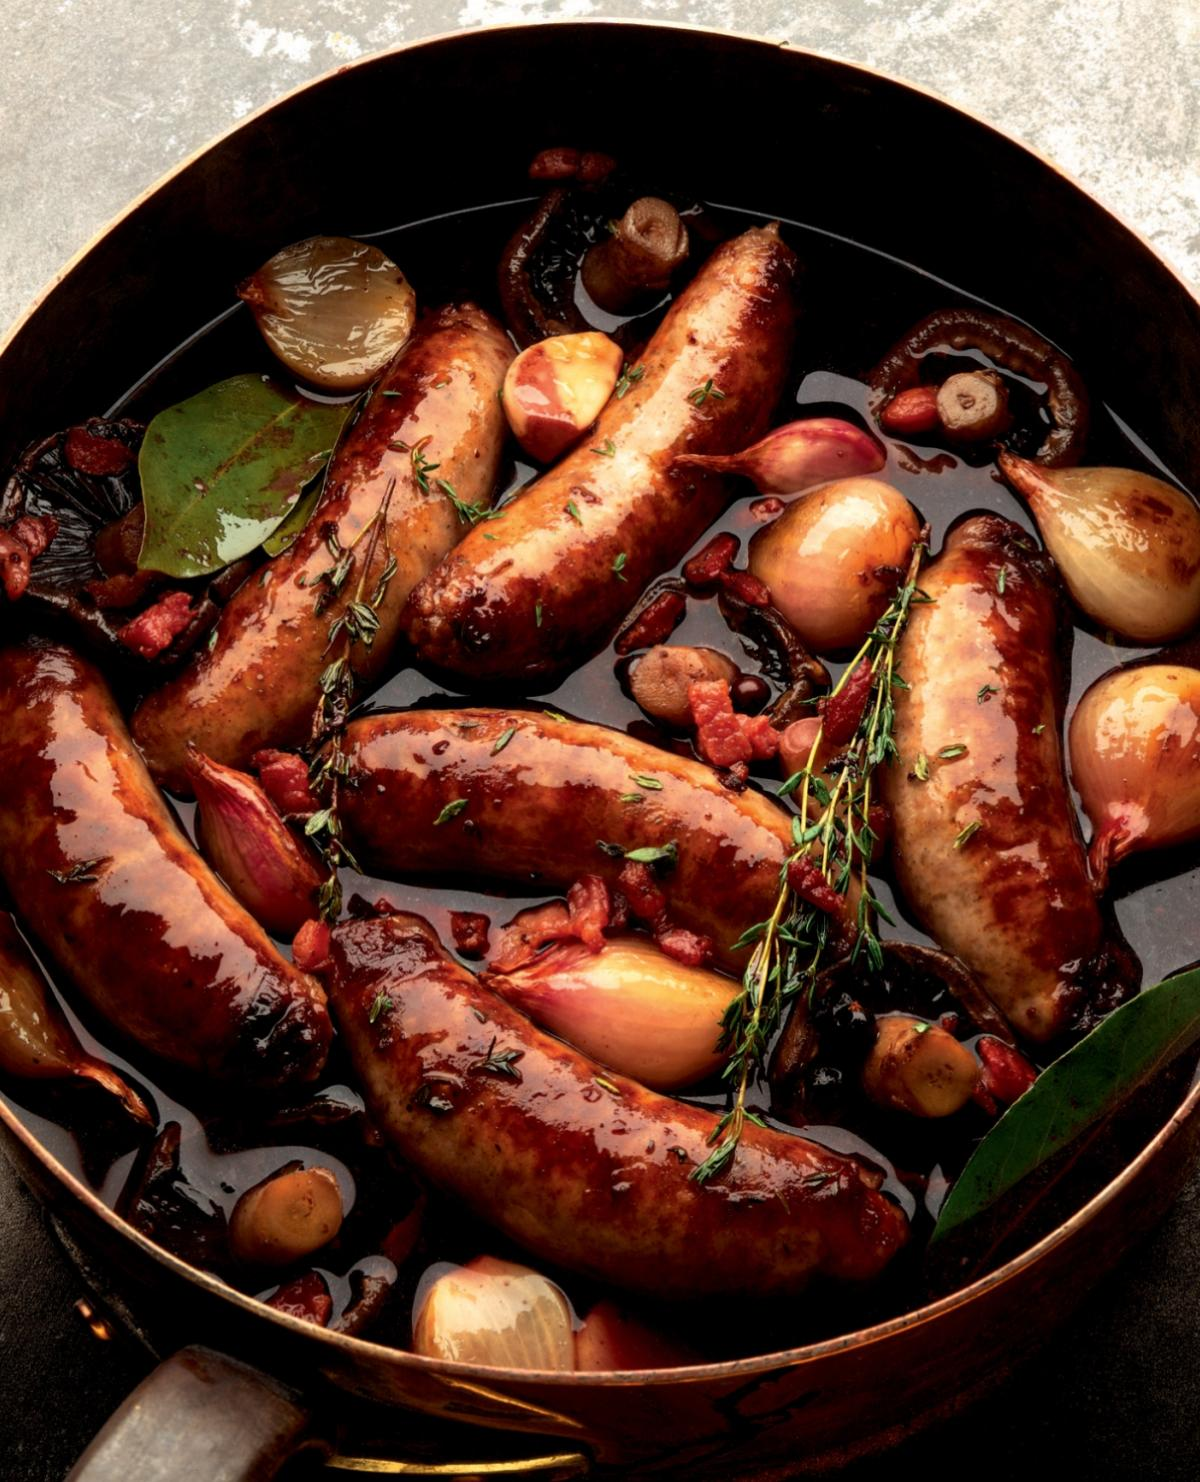 A picture of Delia's Succulent sausages recipes